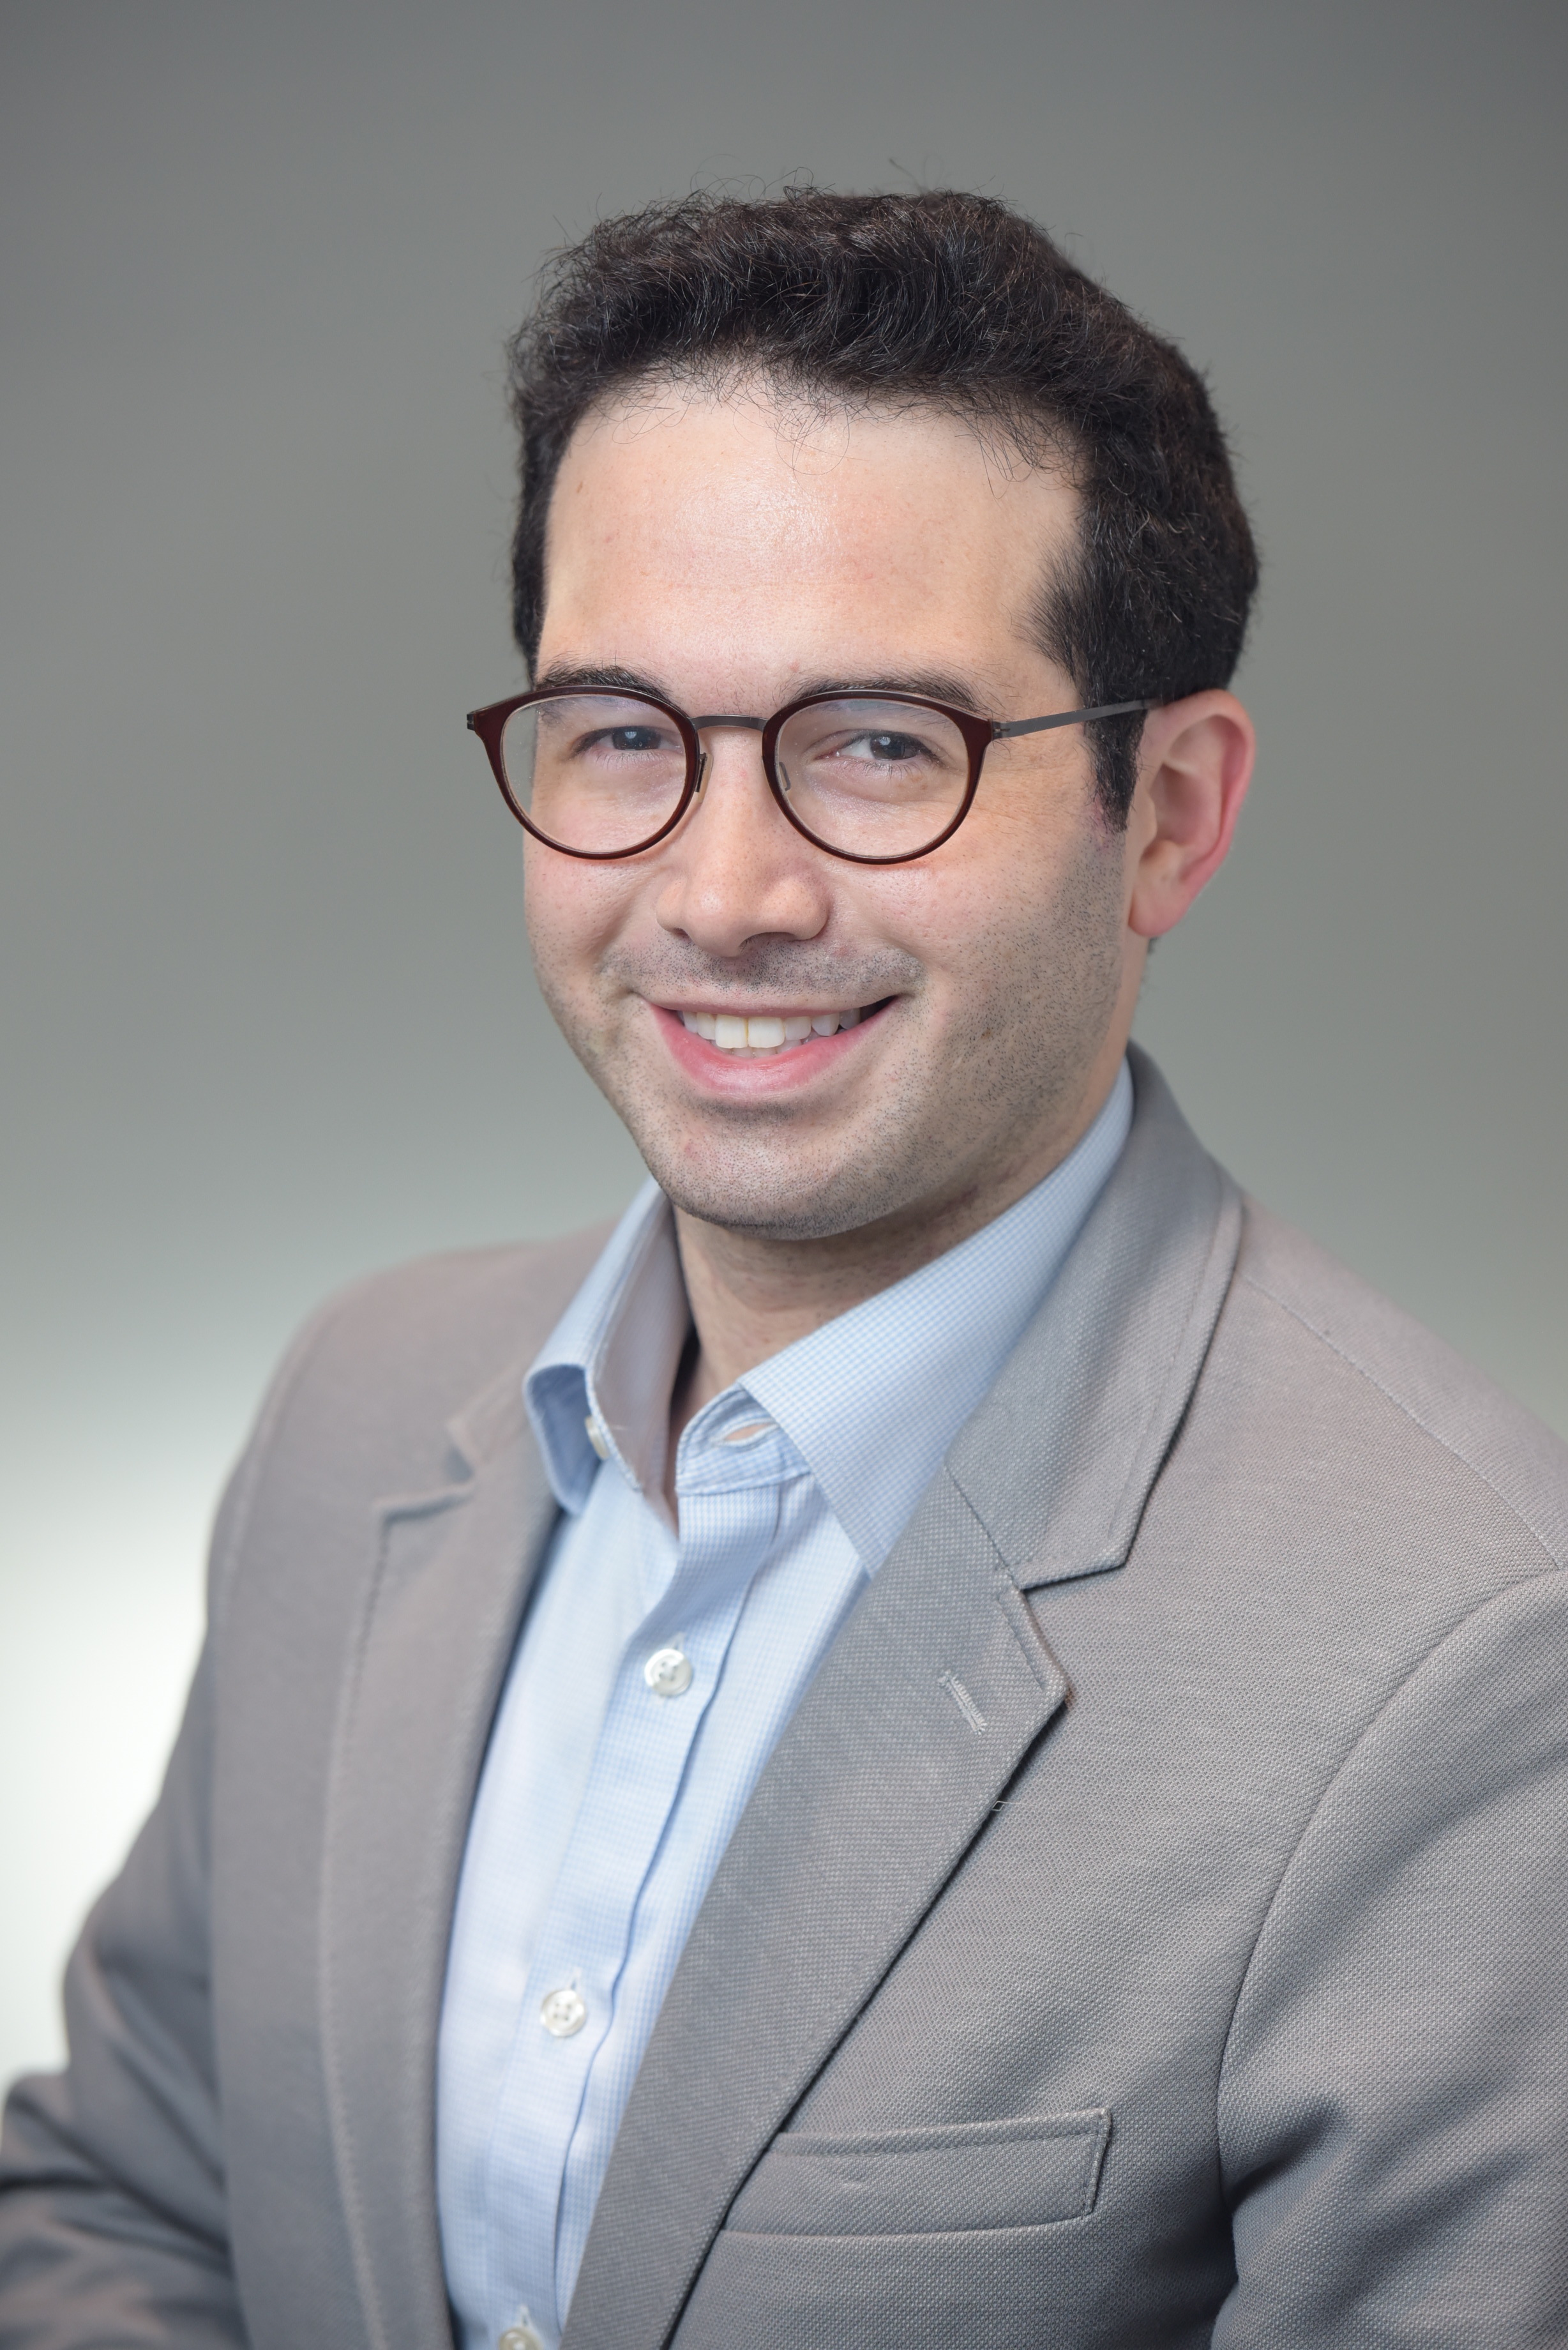 Dr. Alexander Heifitz